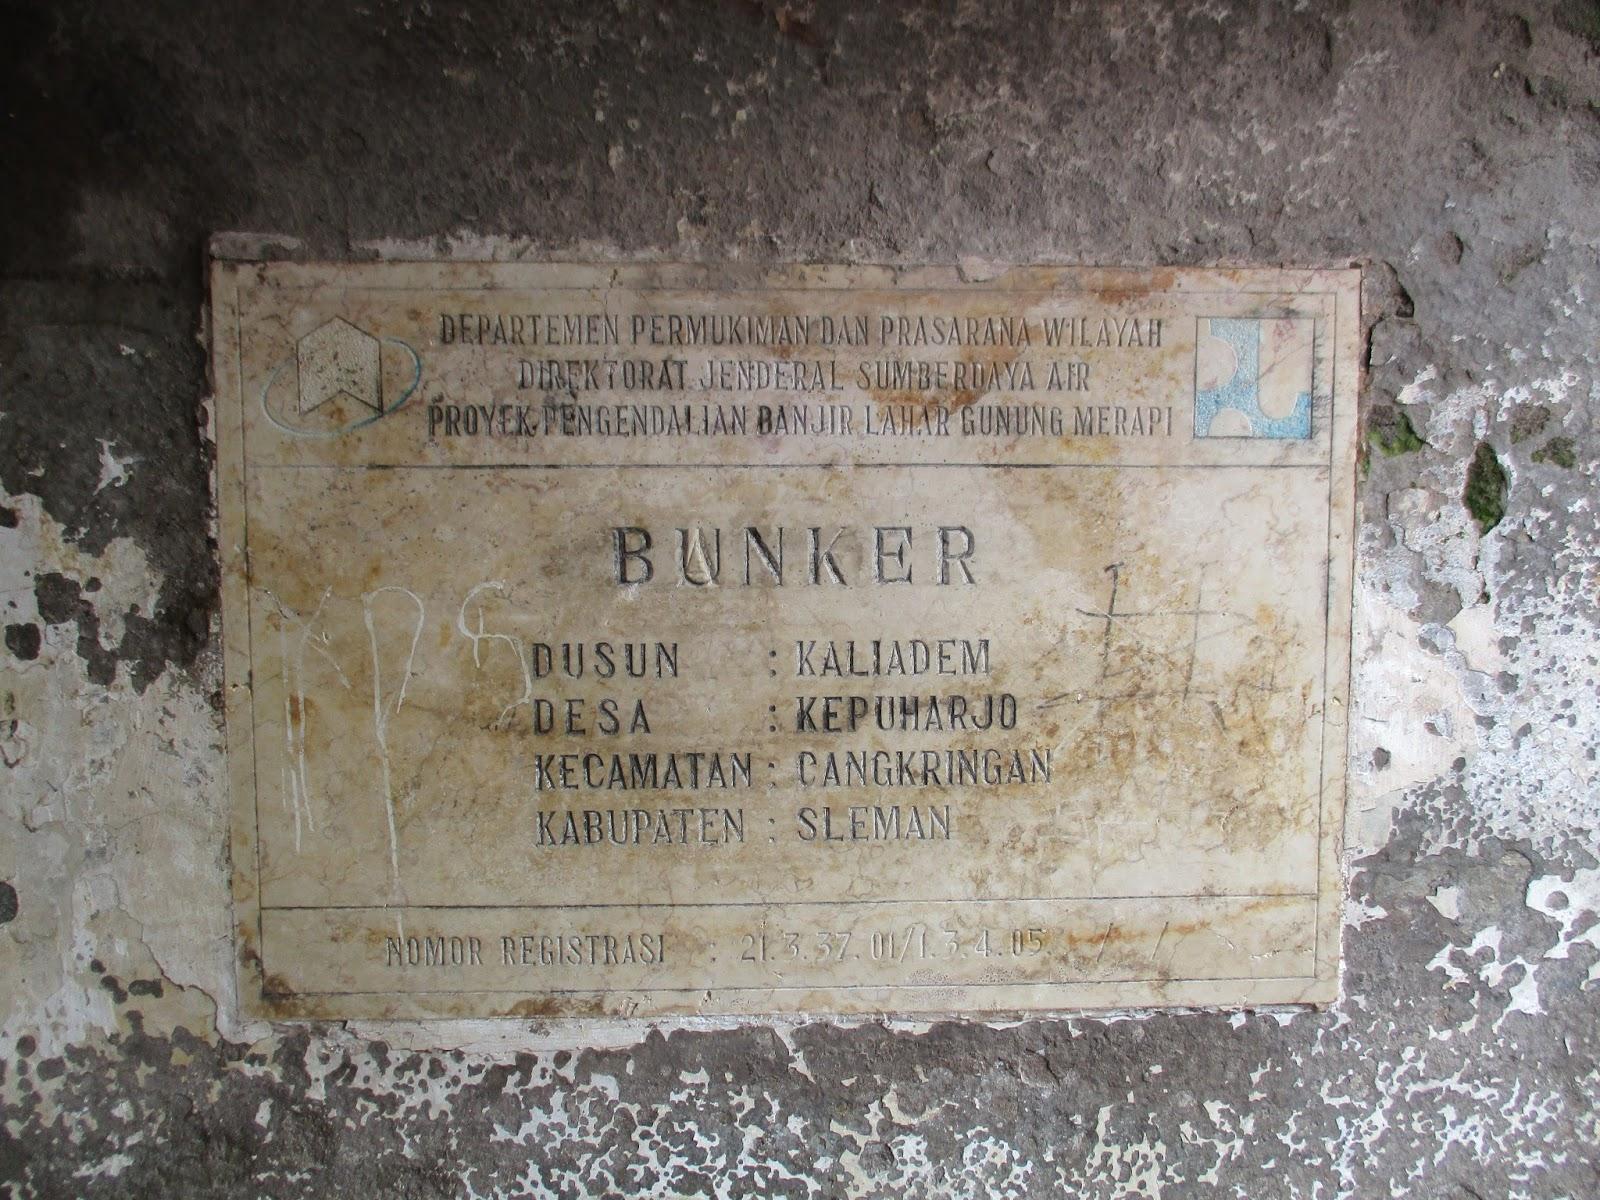 Anak Kampoeng Jogja Jeep Merapi Bunker Kaliadem Kab Sleman